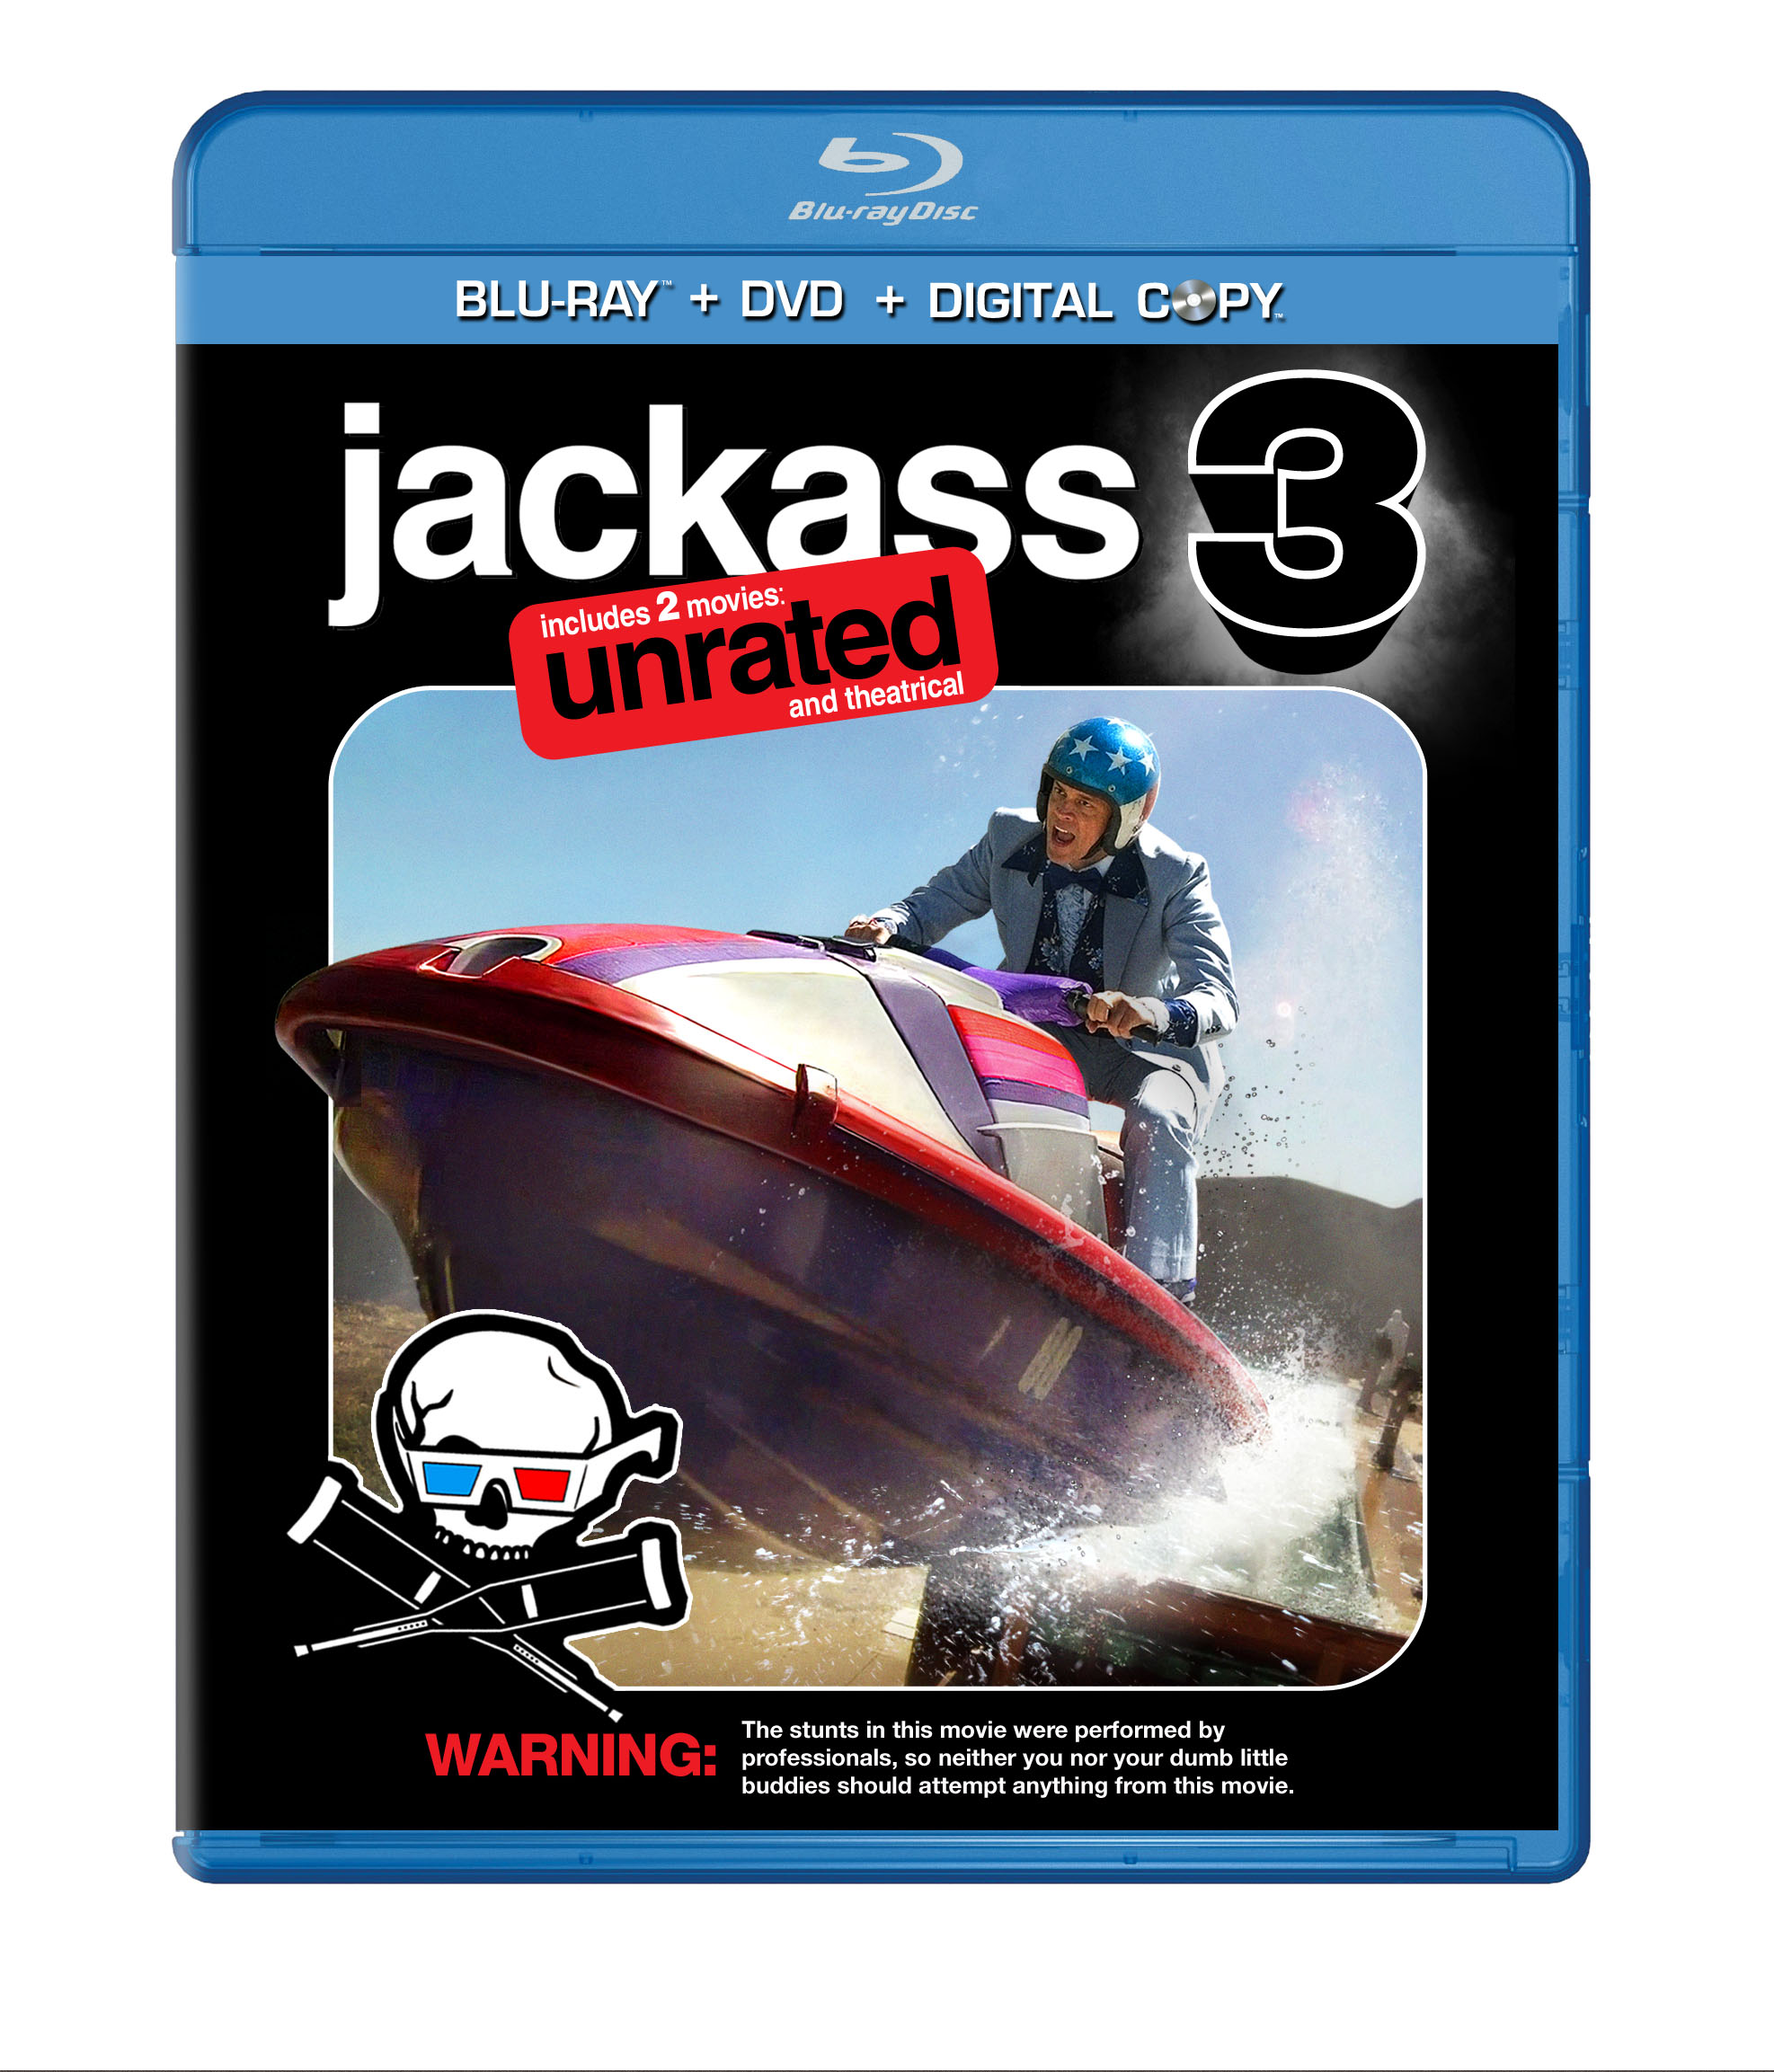 Jackass 3 Blu-ray Cover